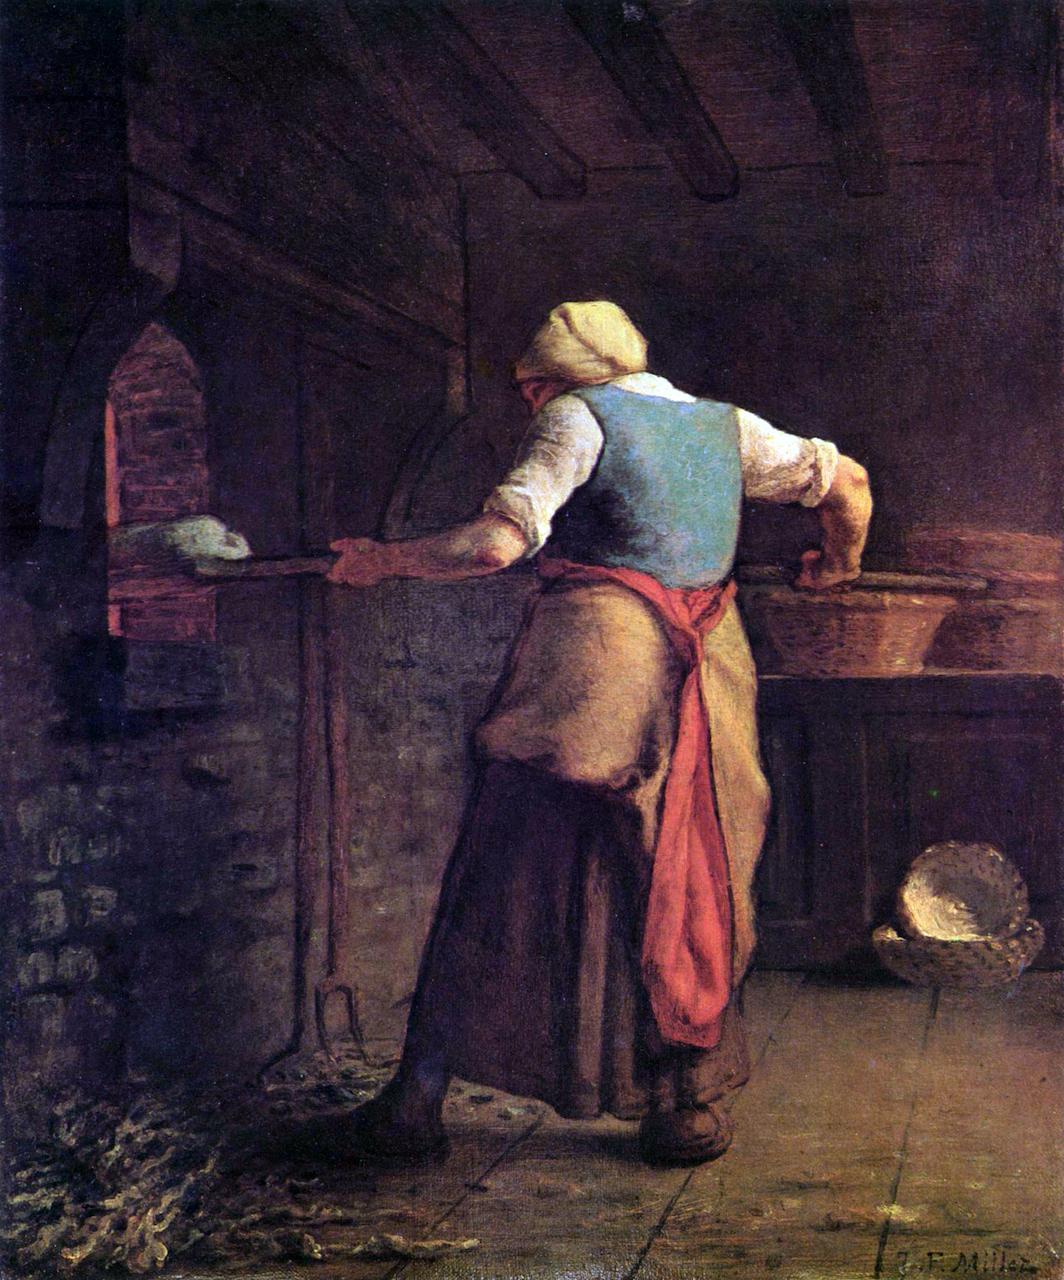 Jean-Francois Millet. Brot backende Frau. 1854. Öl / Leinwand. 55 x 46cm